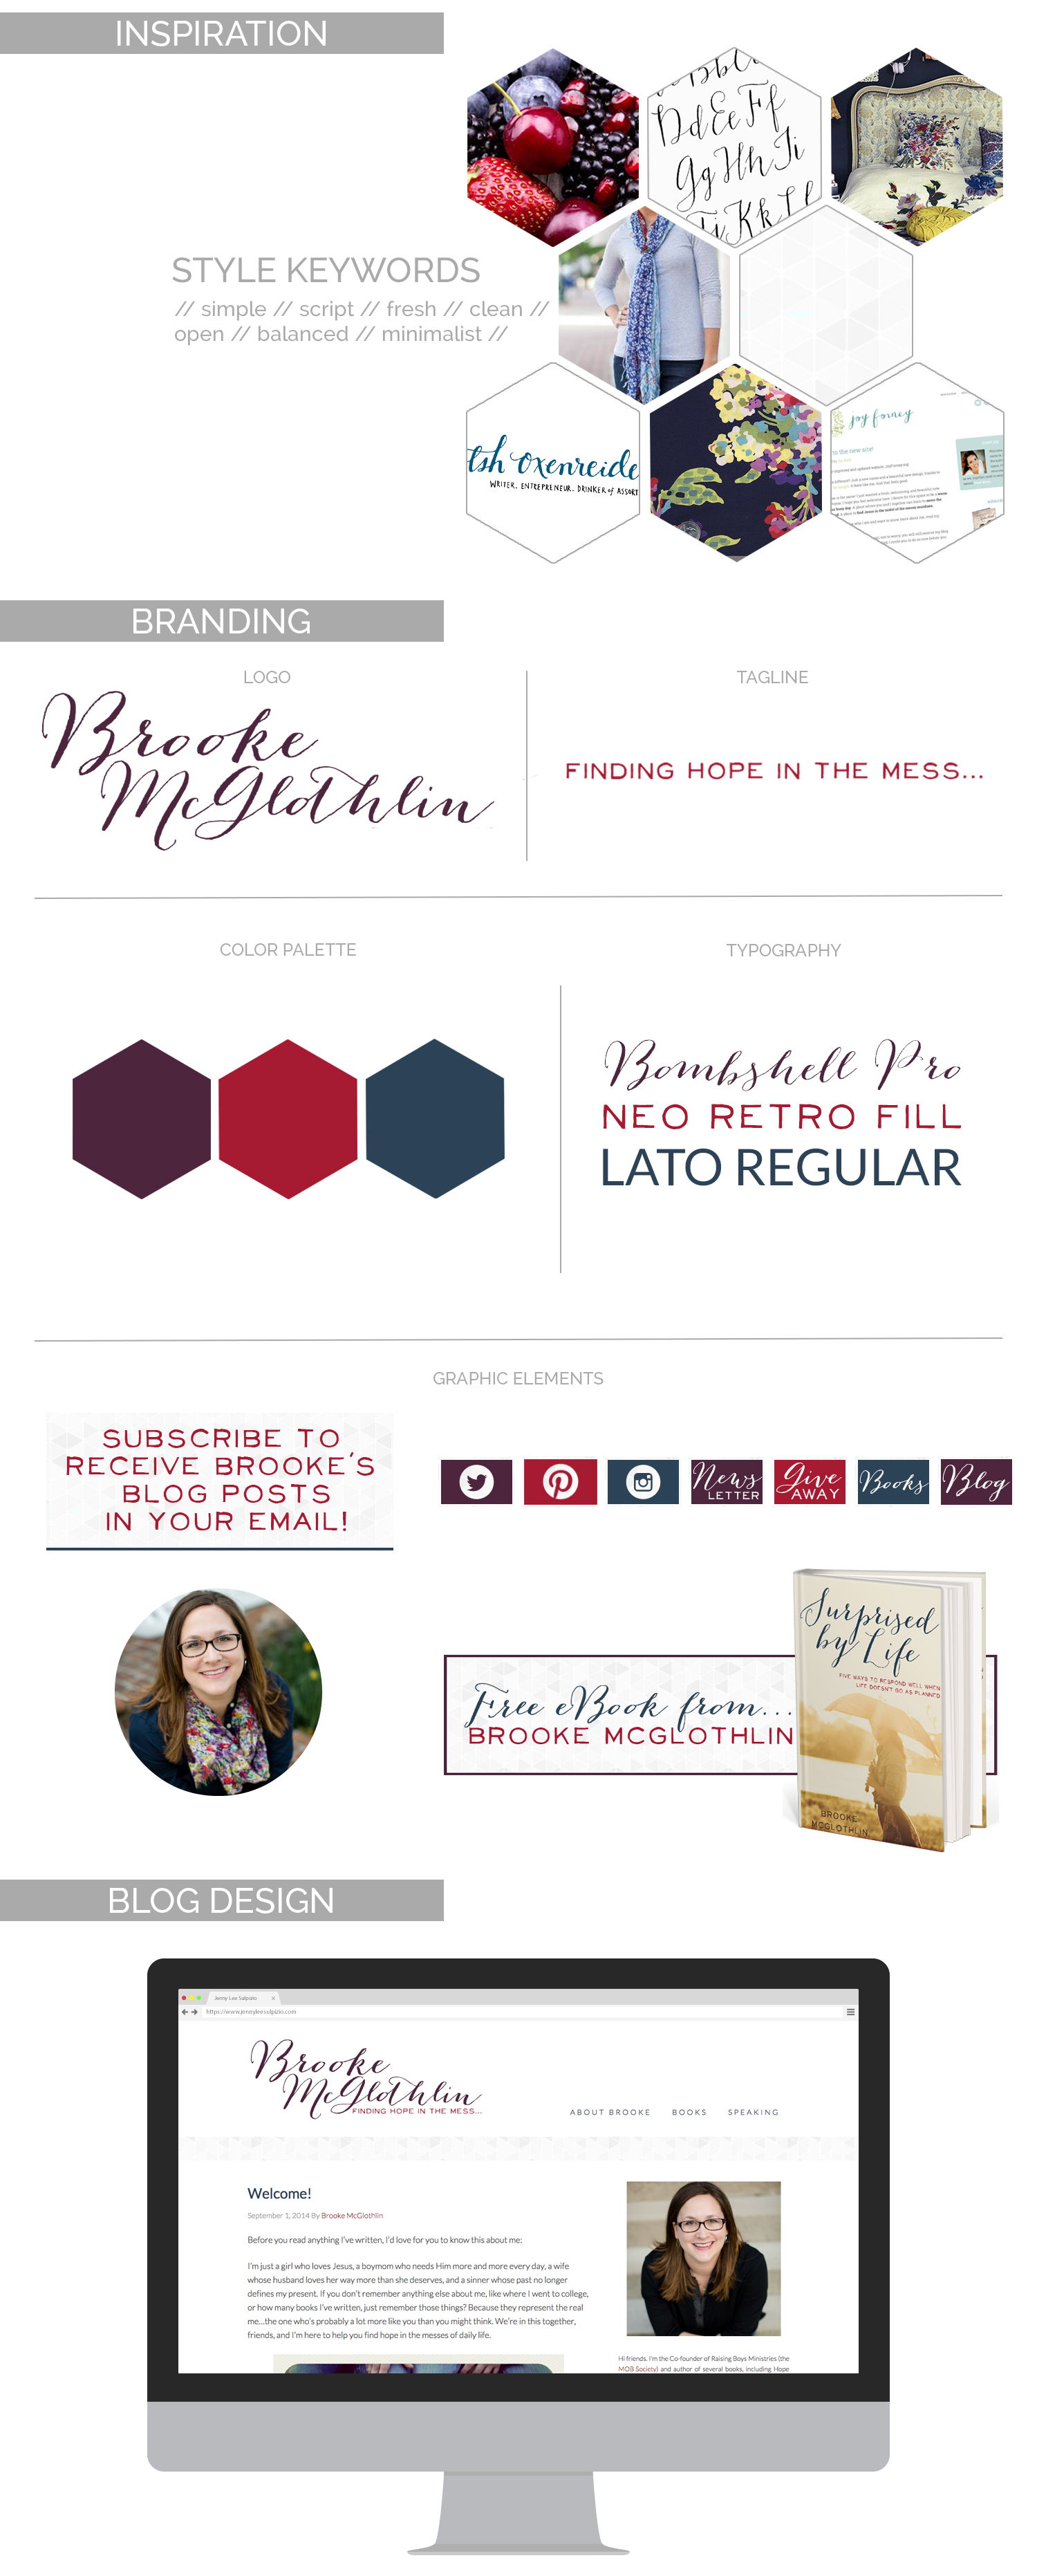 Brooke McGlothlin   Branding and Development by Finding Eden Media